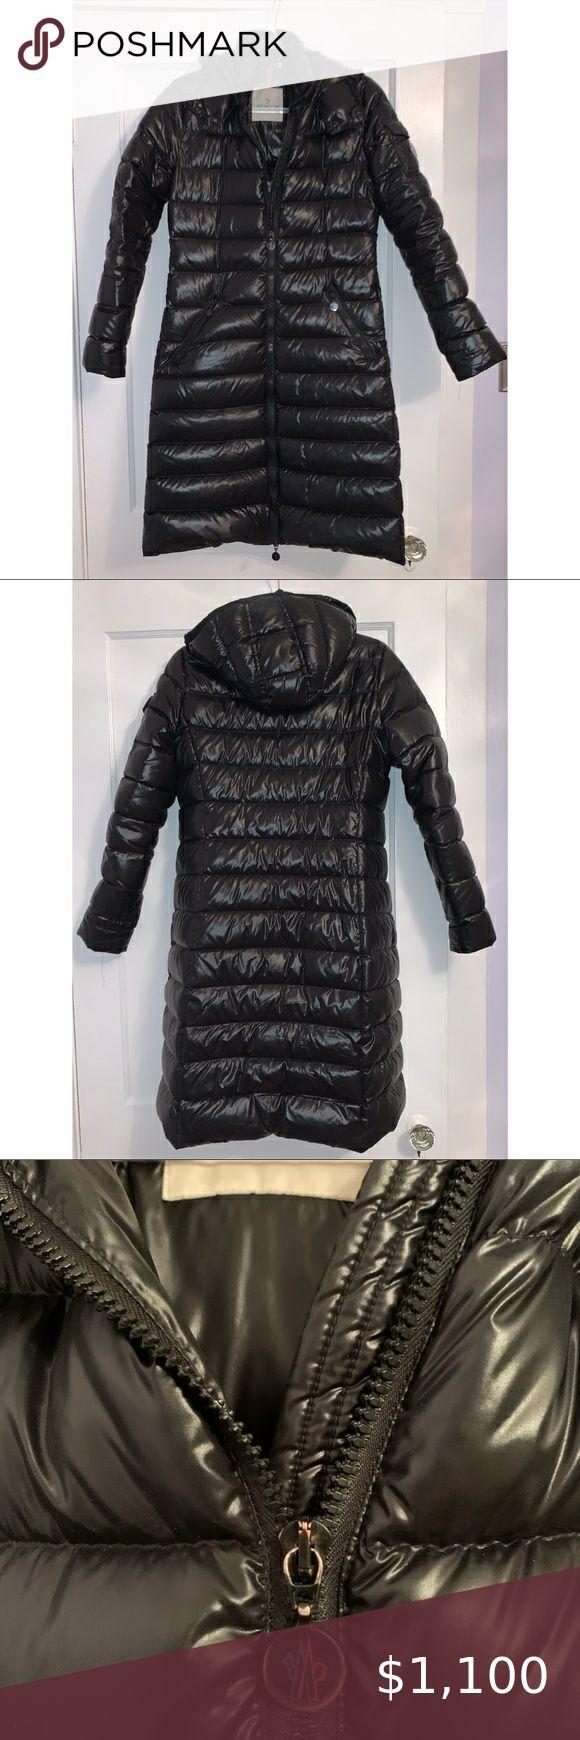 Authentic Moncler women's winter jacket in 2020 Moncler